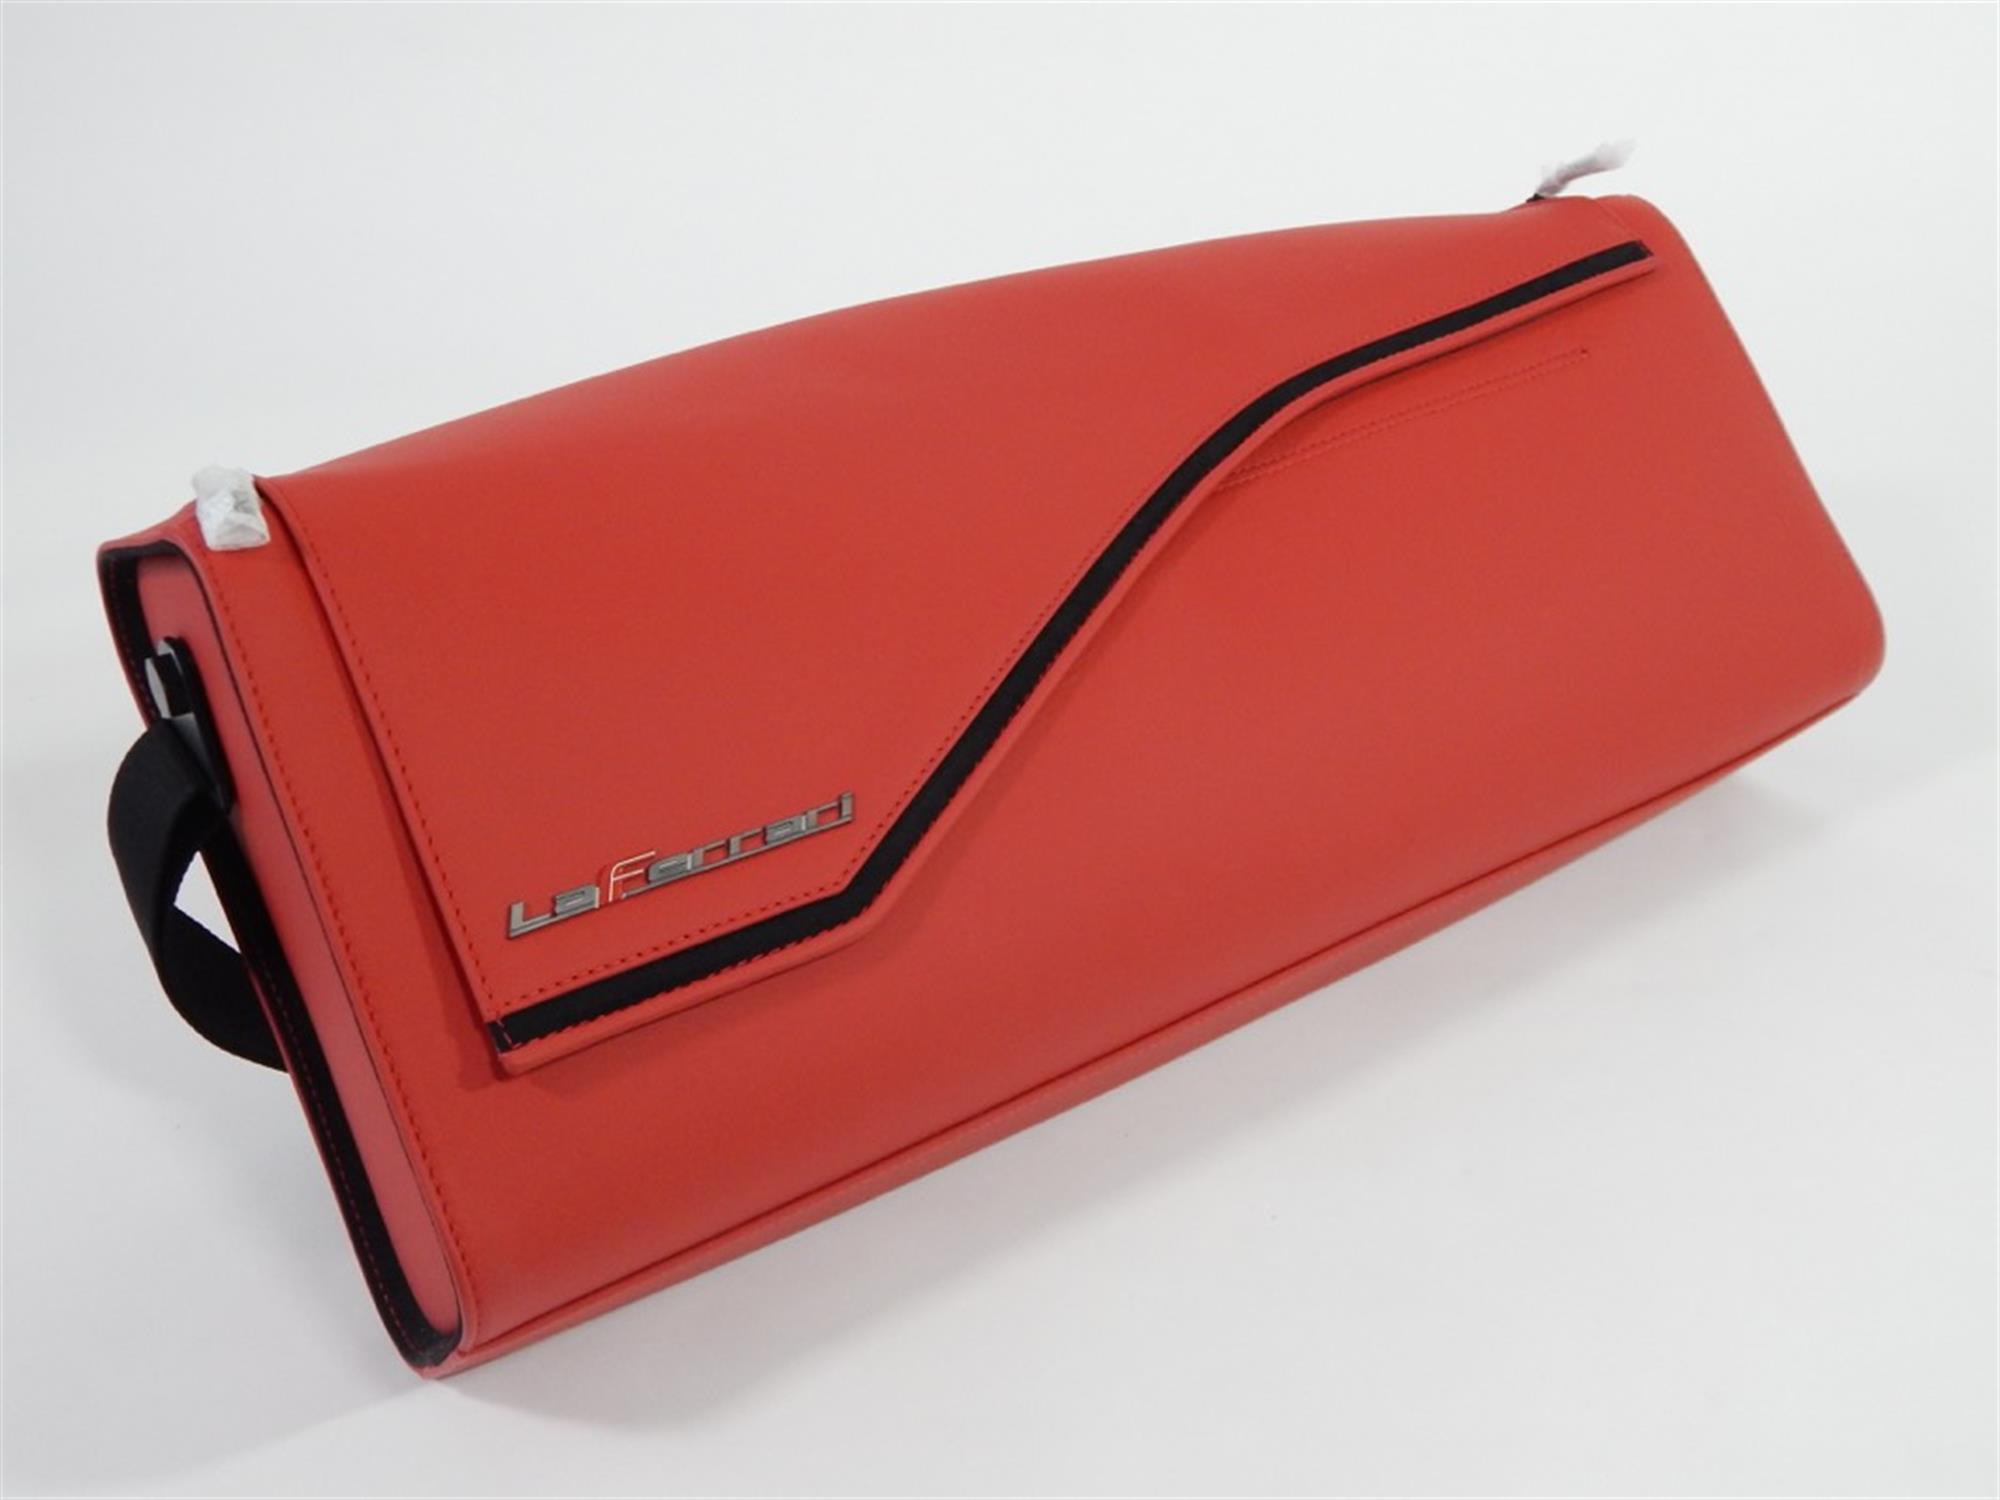 2013 - 2016 Ferrari LaFerrari 2 Piece Complete Schedoni Luggage Set - Image 5 of 10